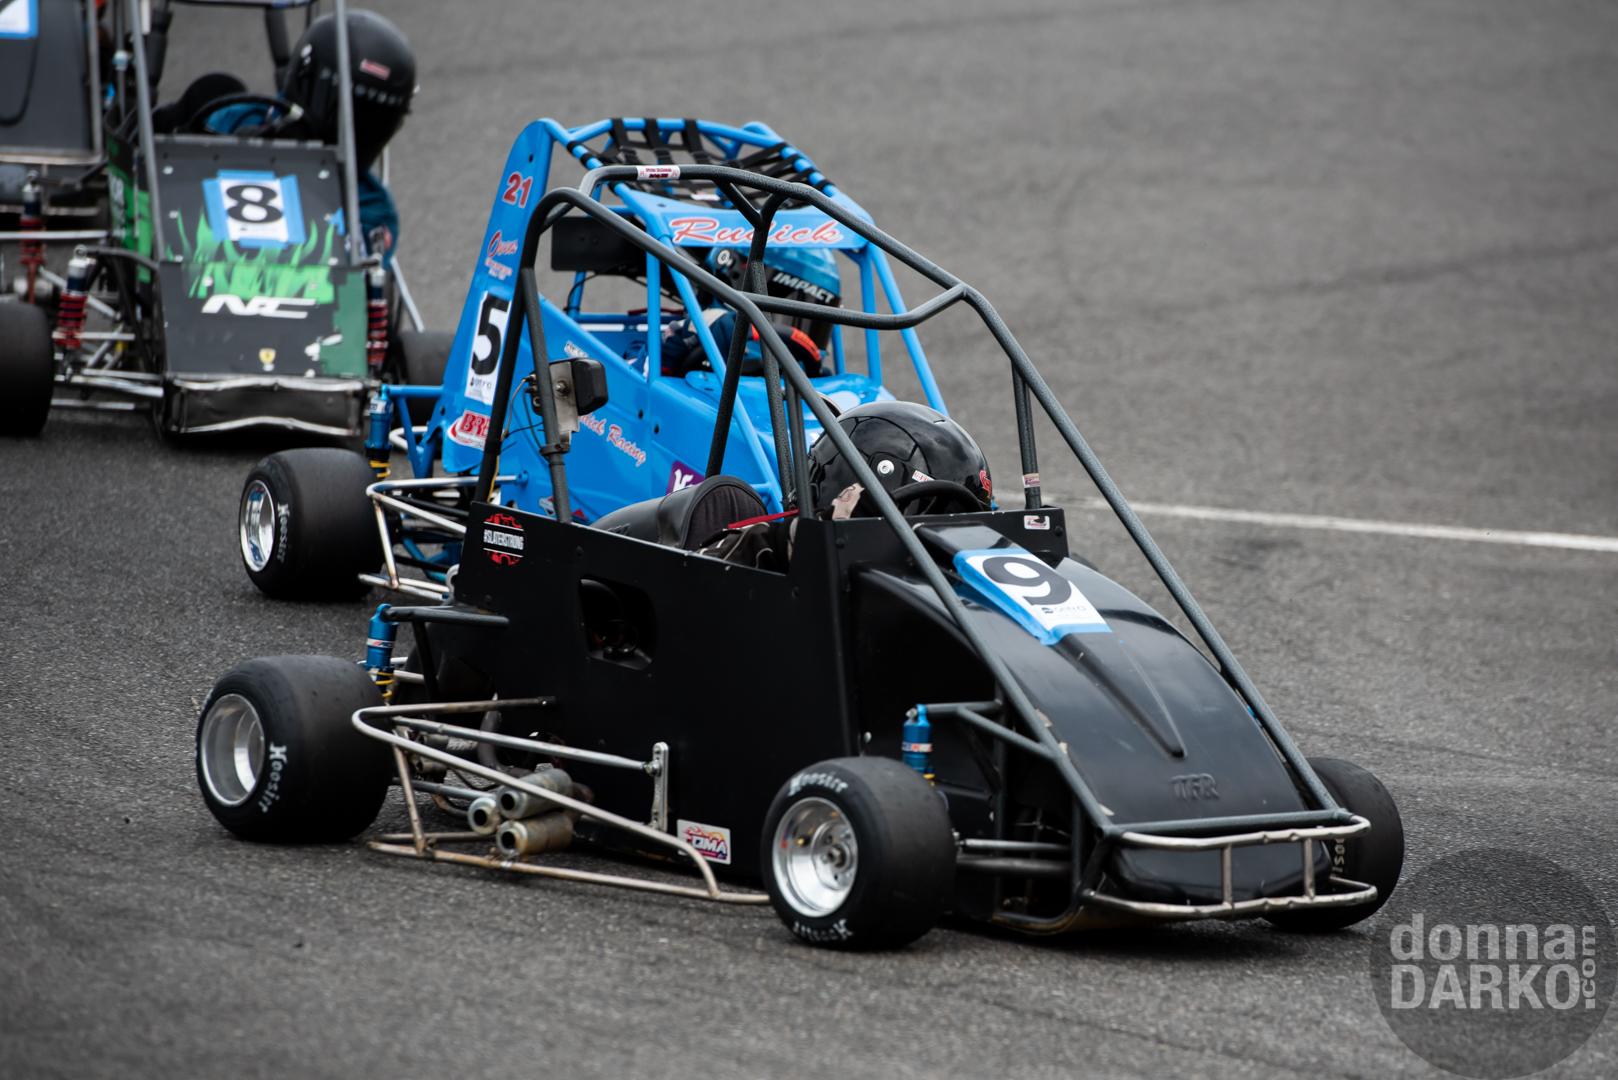 QWMA (Racing) 8-11-2019 DSC_7228.jpg